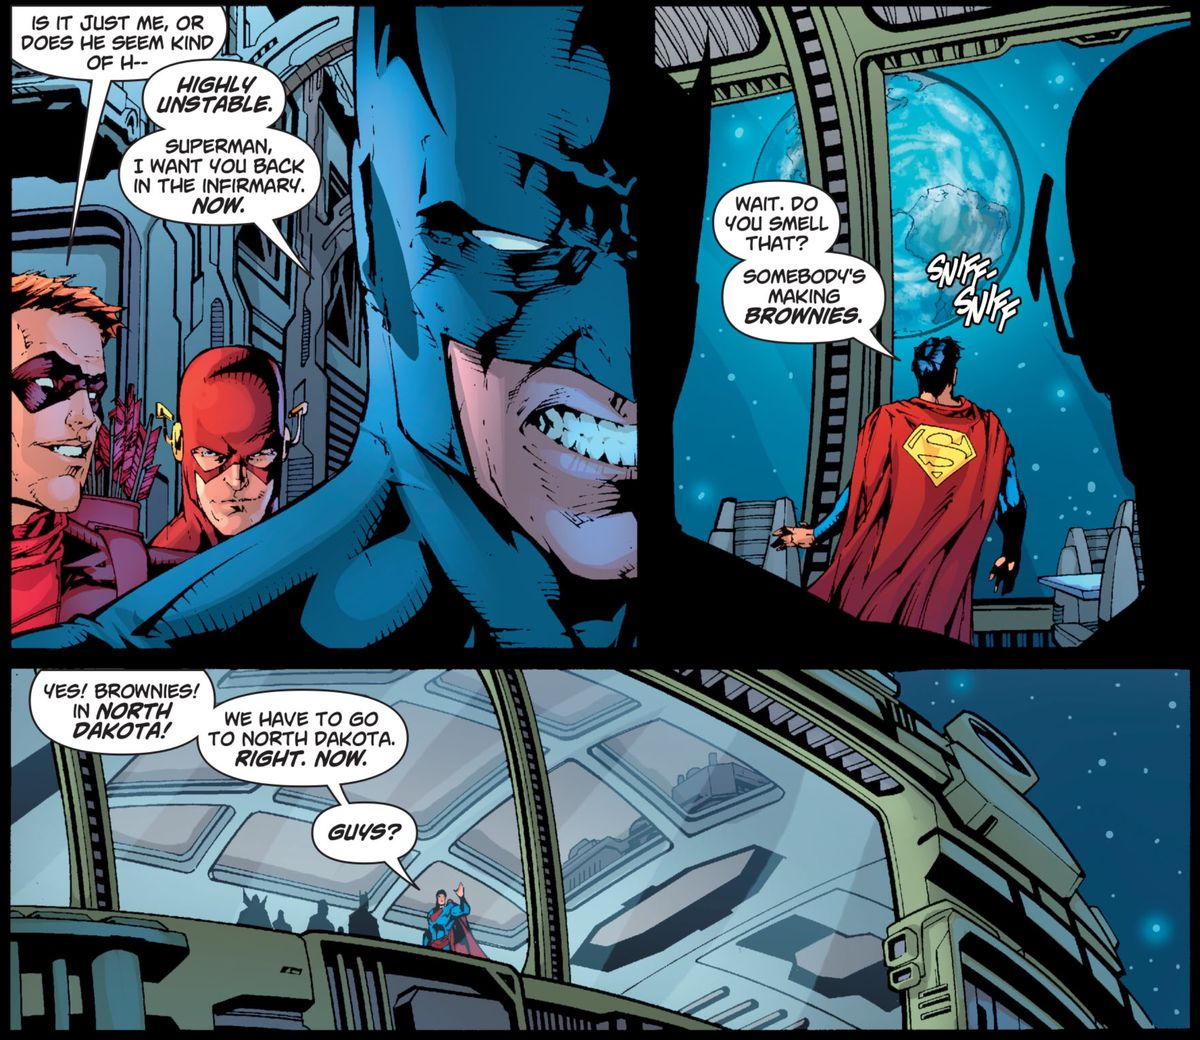 Superman becomes distracted when he senses that someone in North Dakota is making brownies, in Superman/Batman # 46, DC Comics (2008).